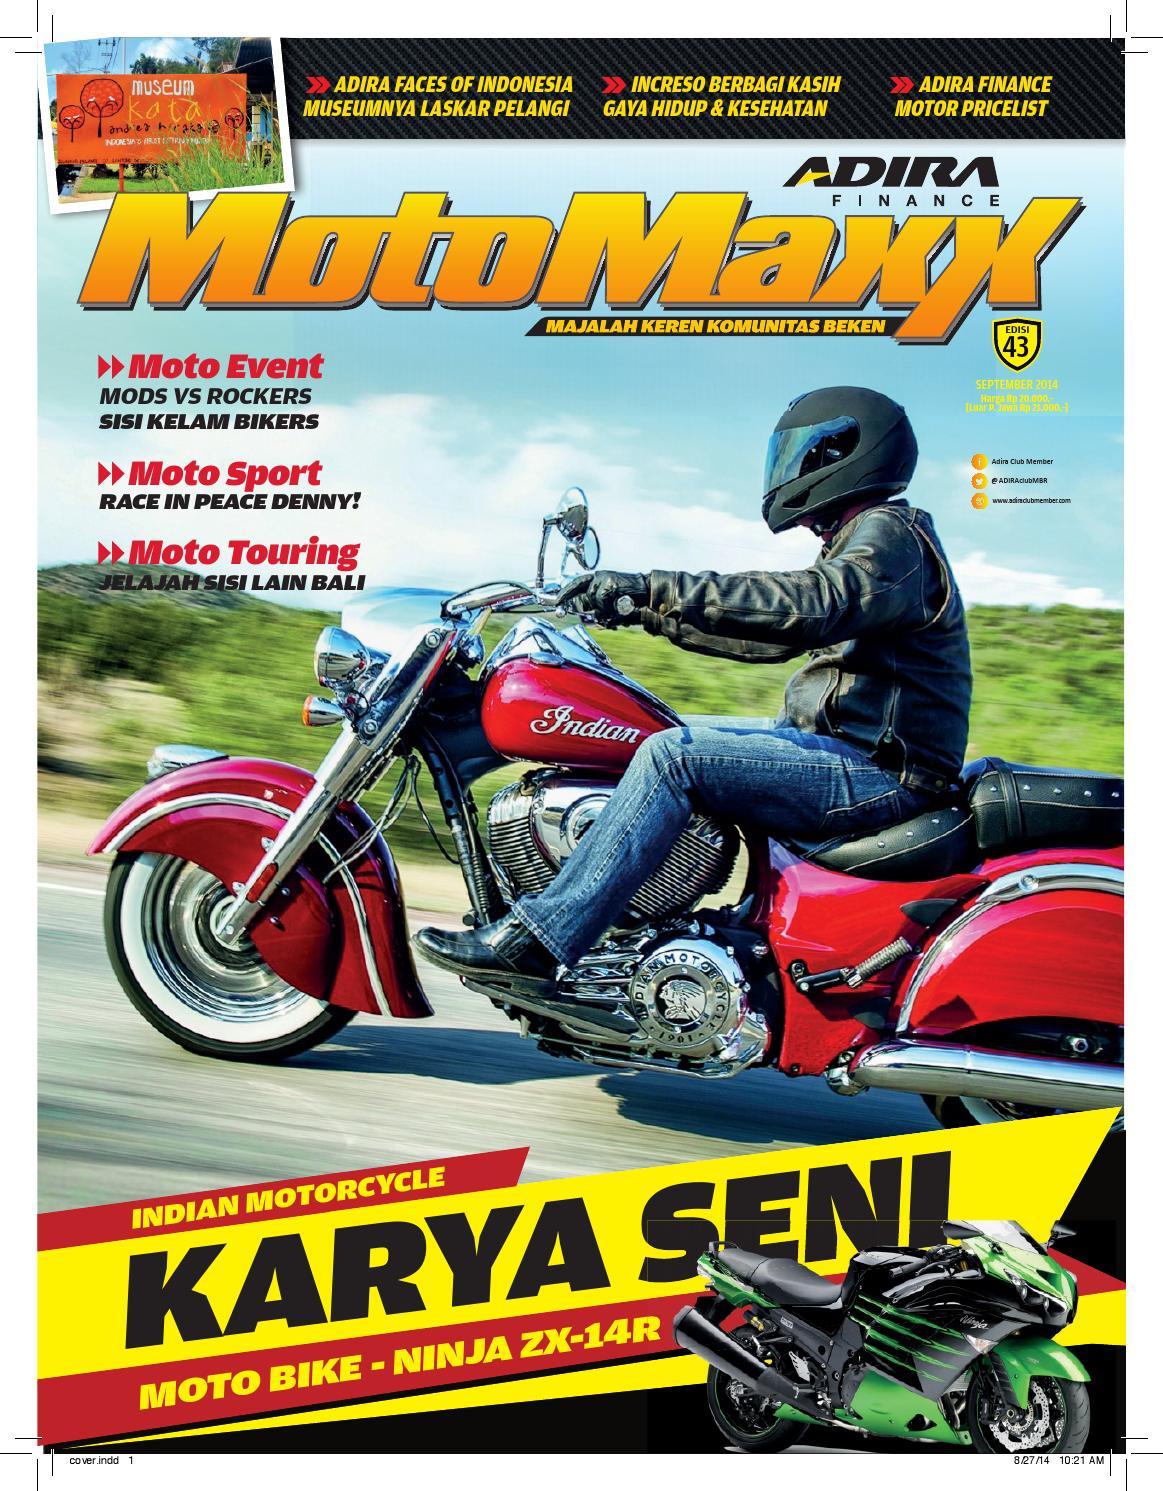 Motomaxx 09 2014 by Adira Member - issuu 9622f3555a